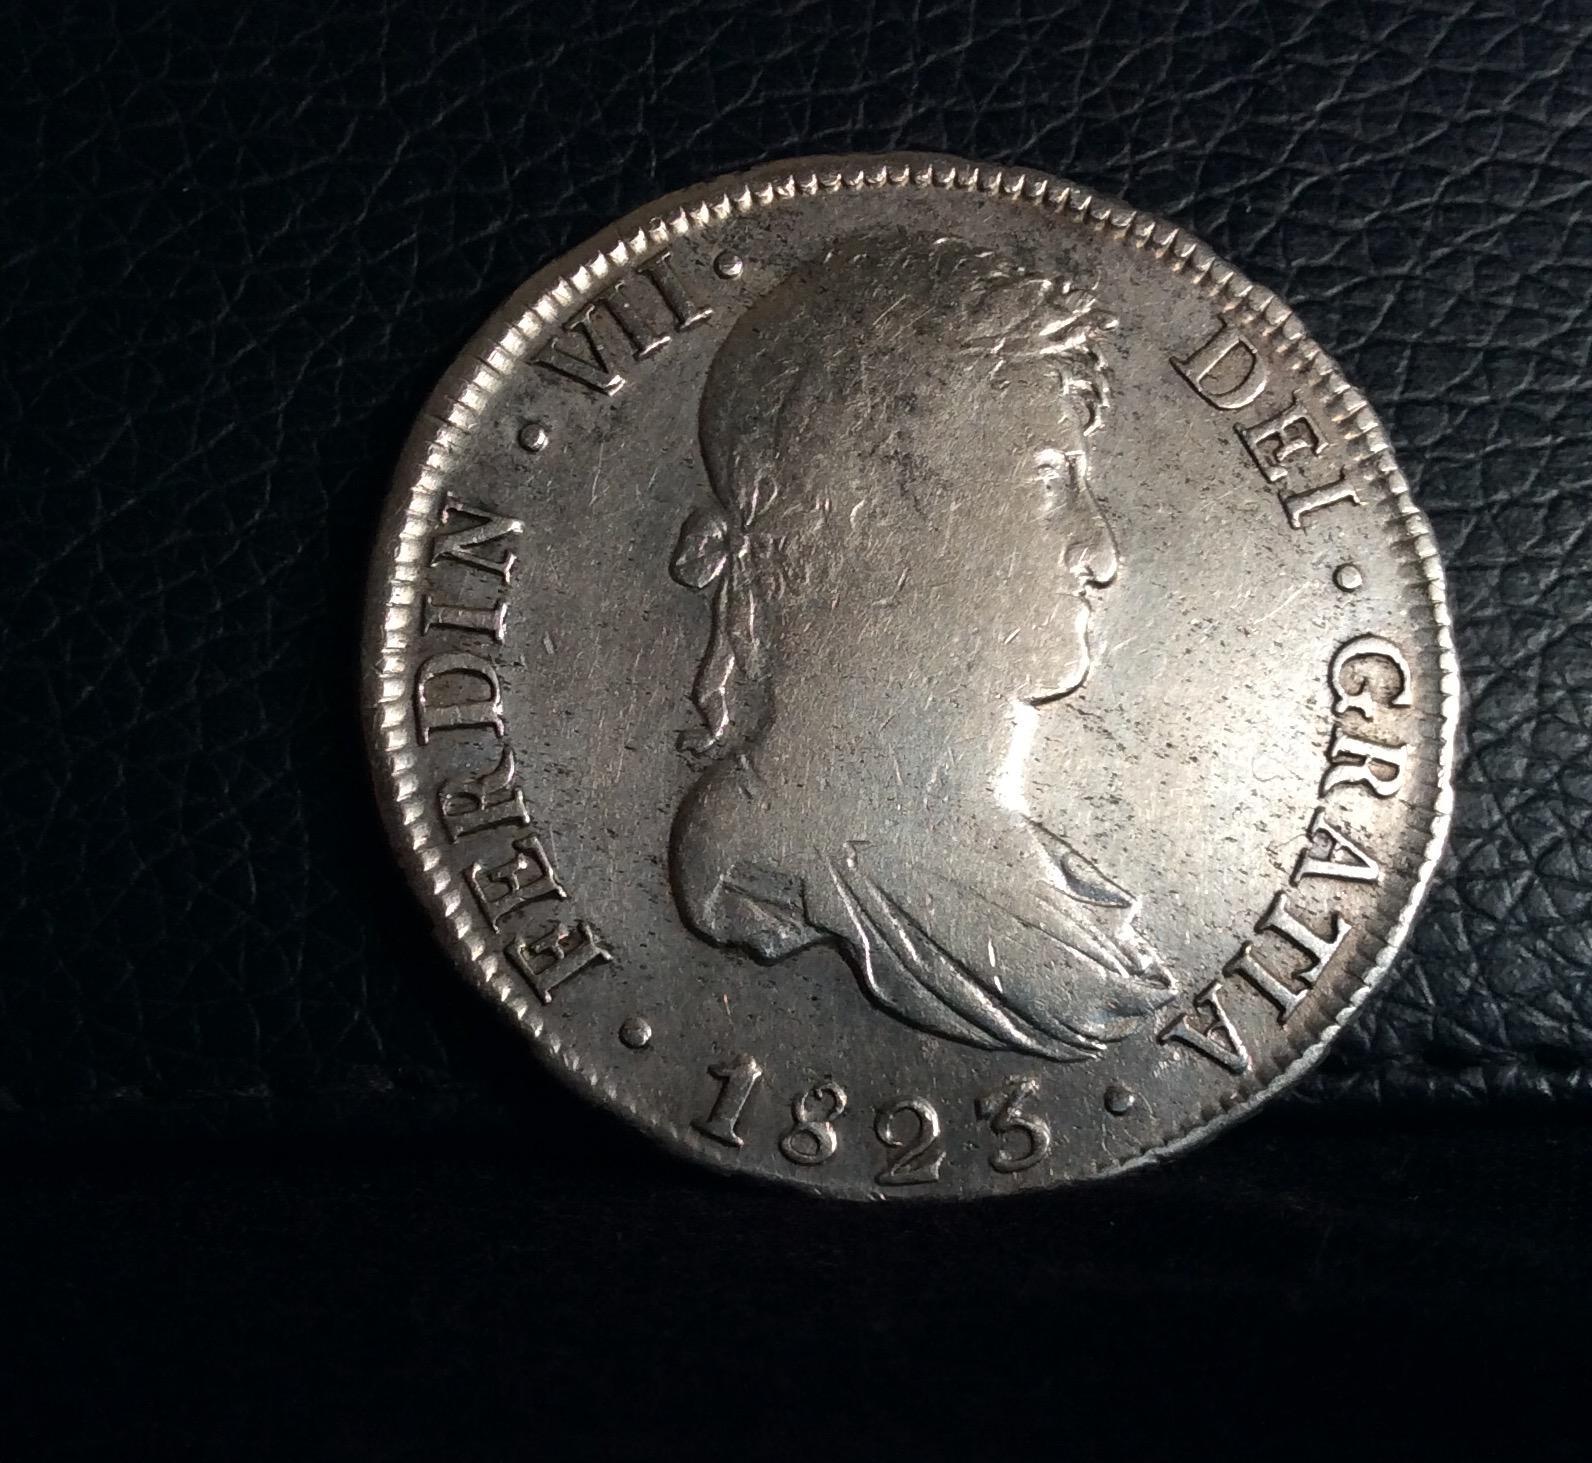 8 REALES 1823 - POTOSI - FERNANDO VII